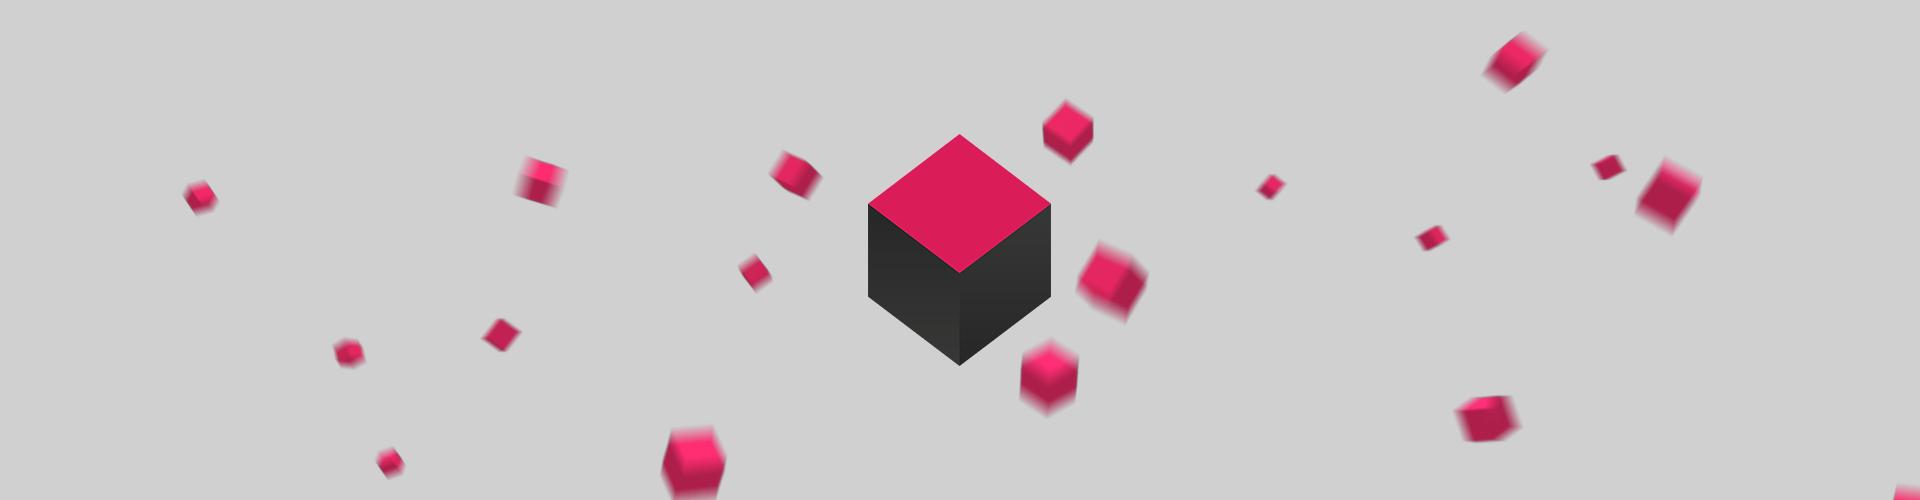 Cublast HD | Release